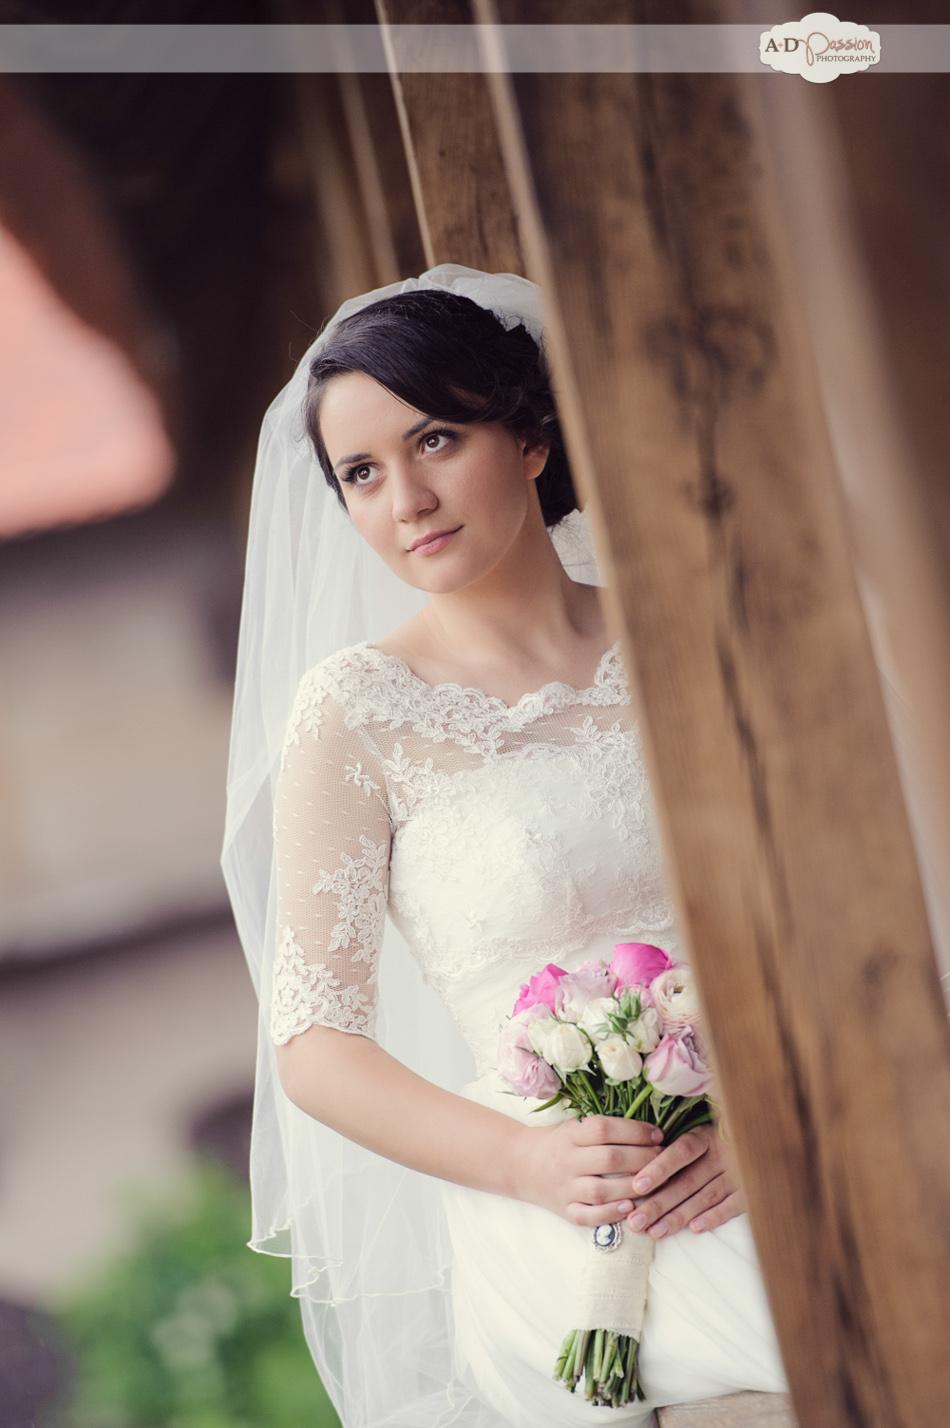 AD Passion Photography | fotograf-nunta_flavian-si-alina_nunta-targu-mures_0053 | Adelin, Dida, fotograf profesionist, fotograf de nunta, fotografie de nunta, fotograf Timisoara, fotograf Craiova, fotograf Bucuresti, fotograf Arad, nunta Timisoara, nunta Arad, nunta Bucuresti, nunta Craiova